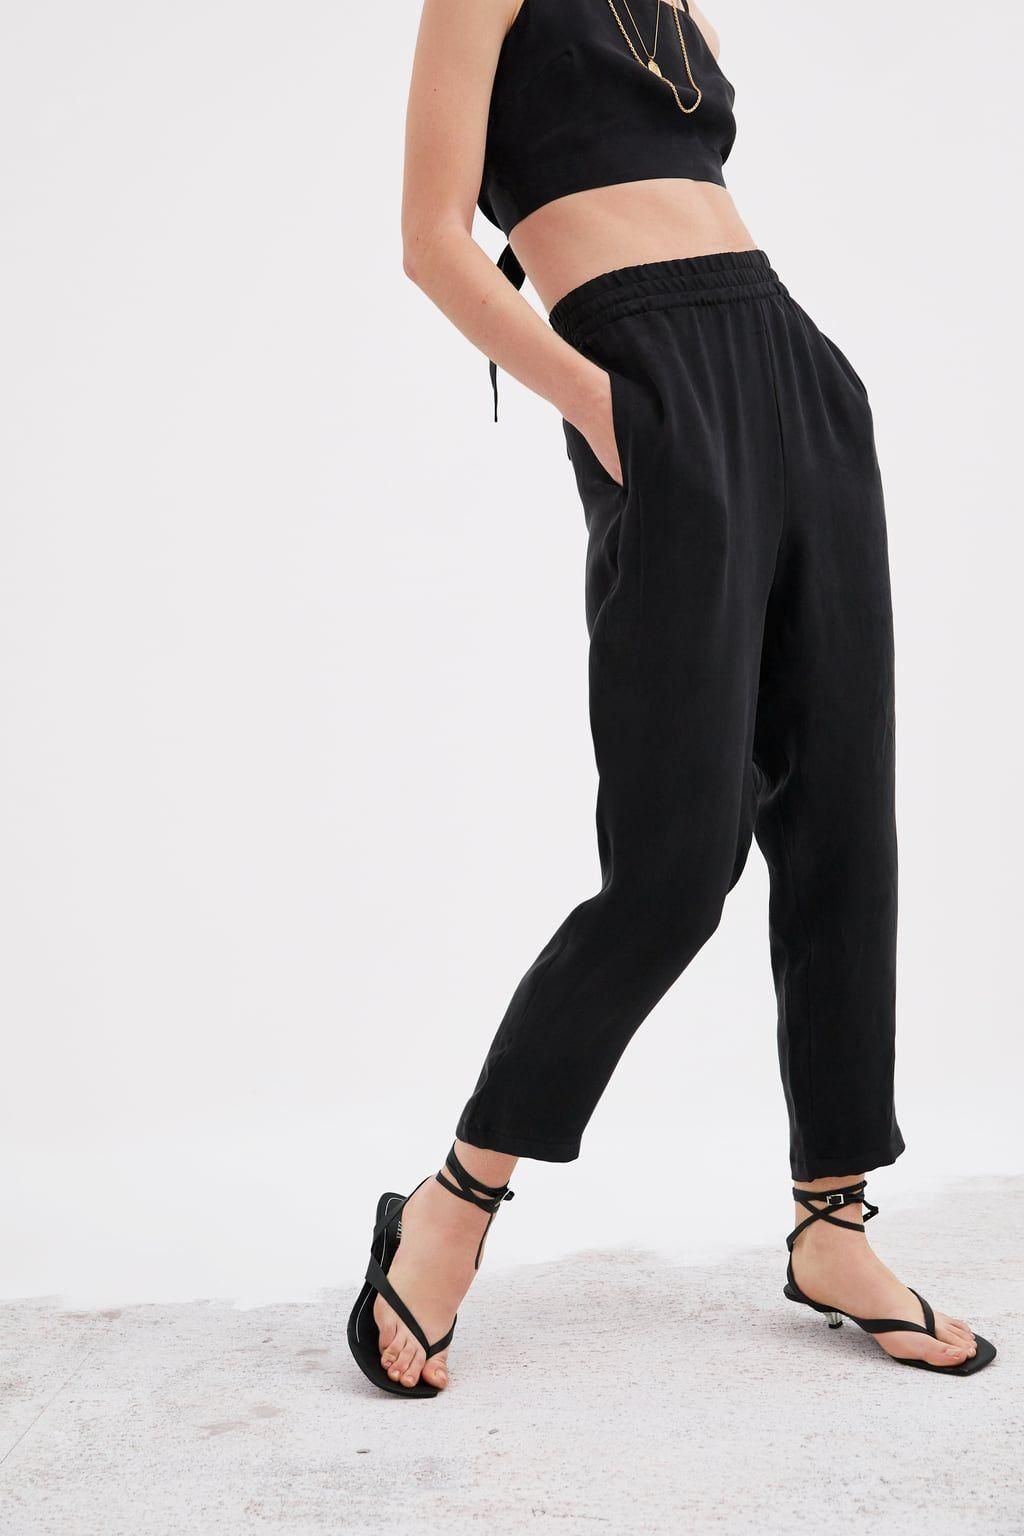 Loosefitting joggers trousers women jogging pants